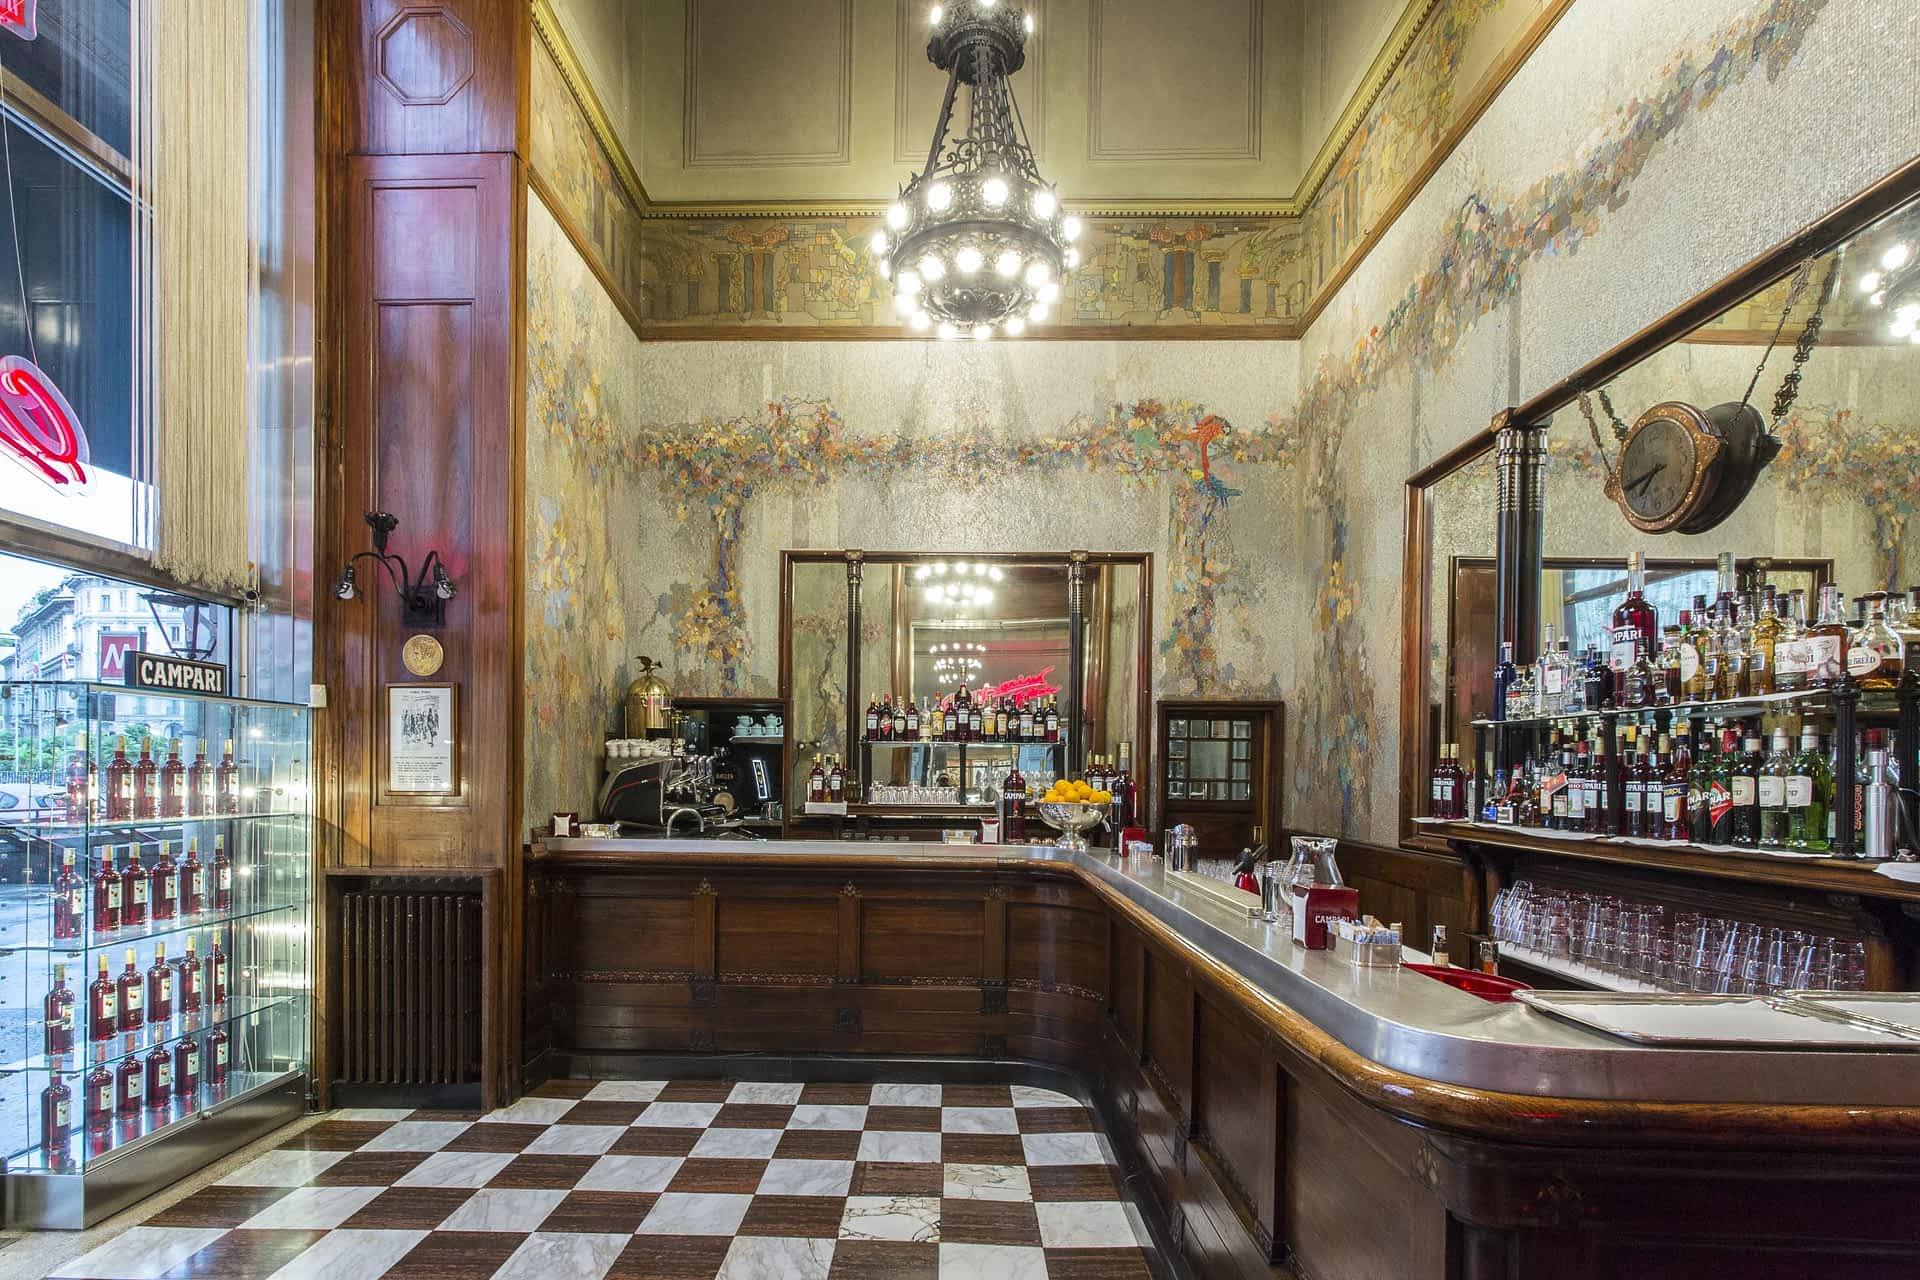 Camperino Bar in Mailand